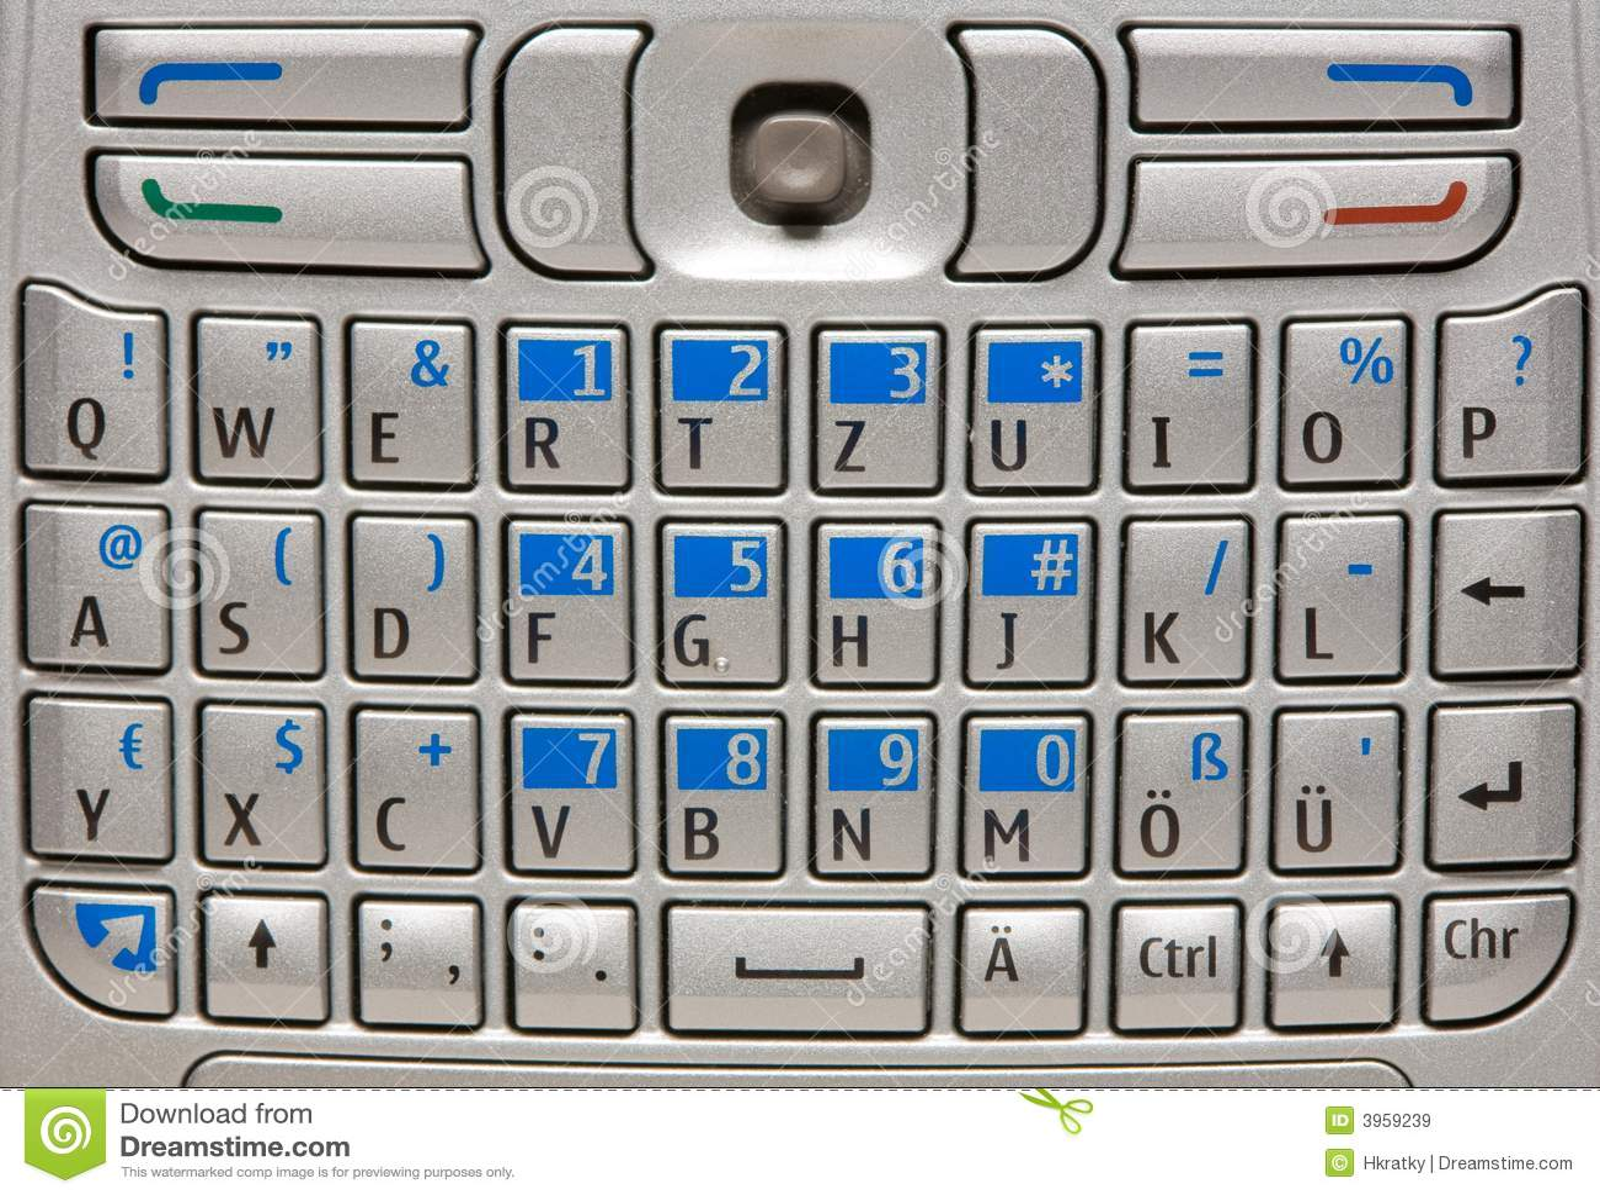 Mobile Phone Keyboard Stock Image Image Of Mobile Smart 3959239